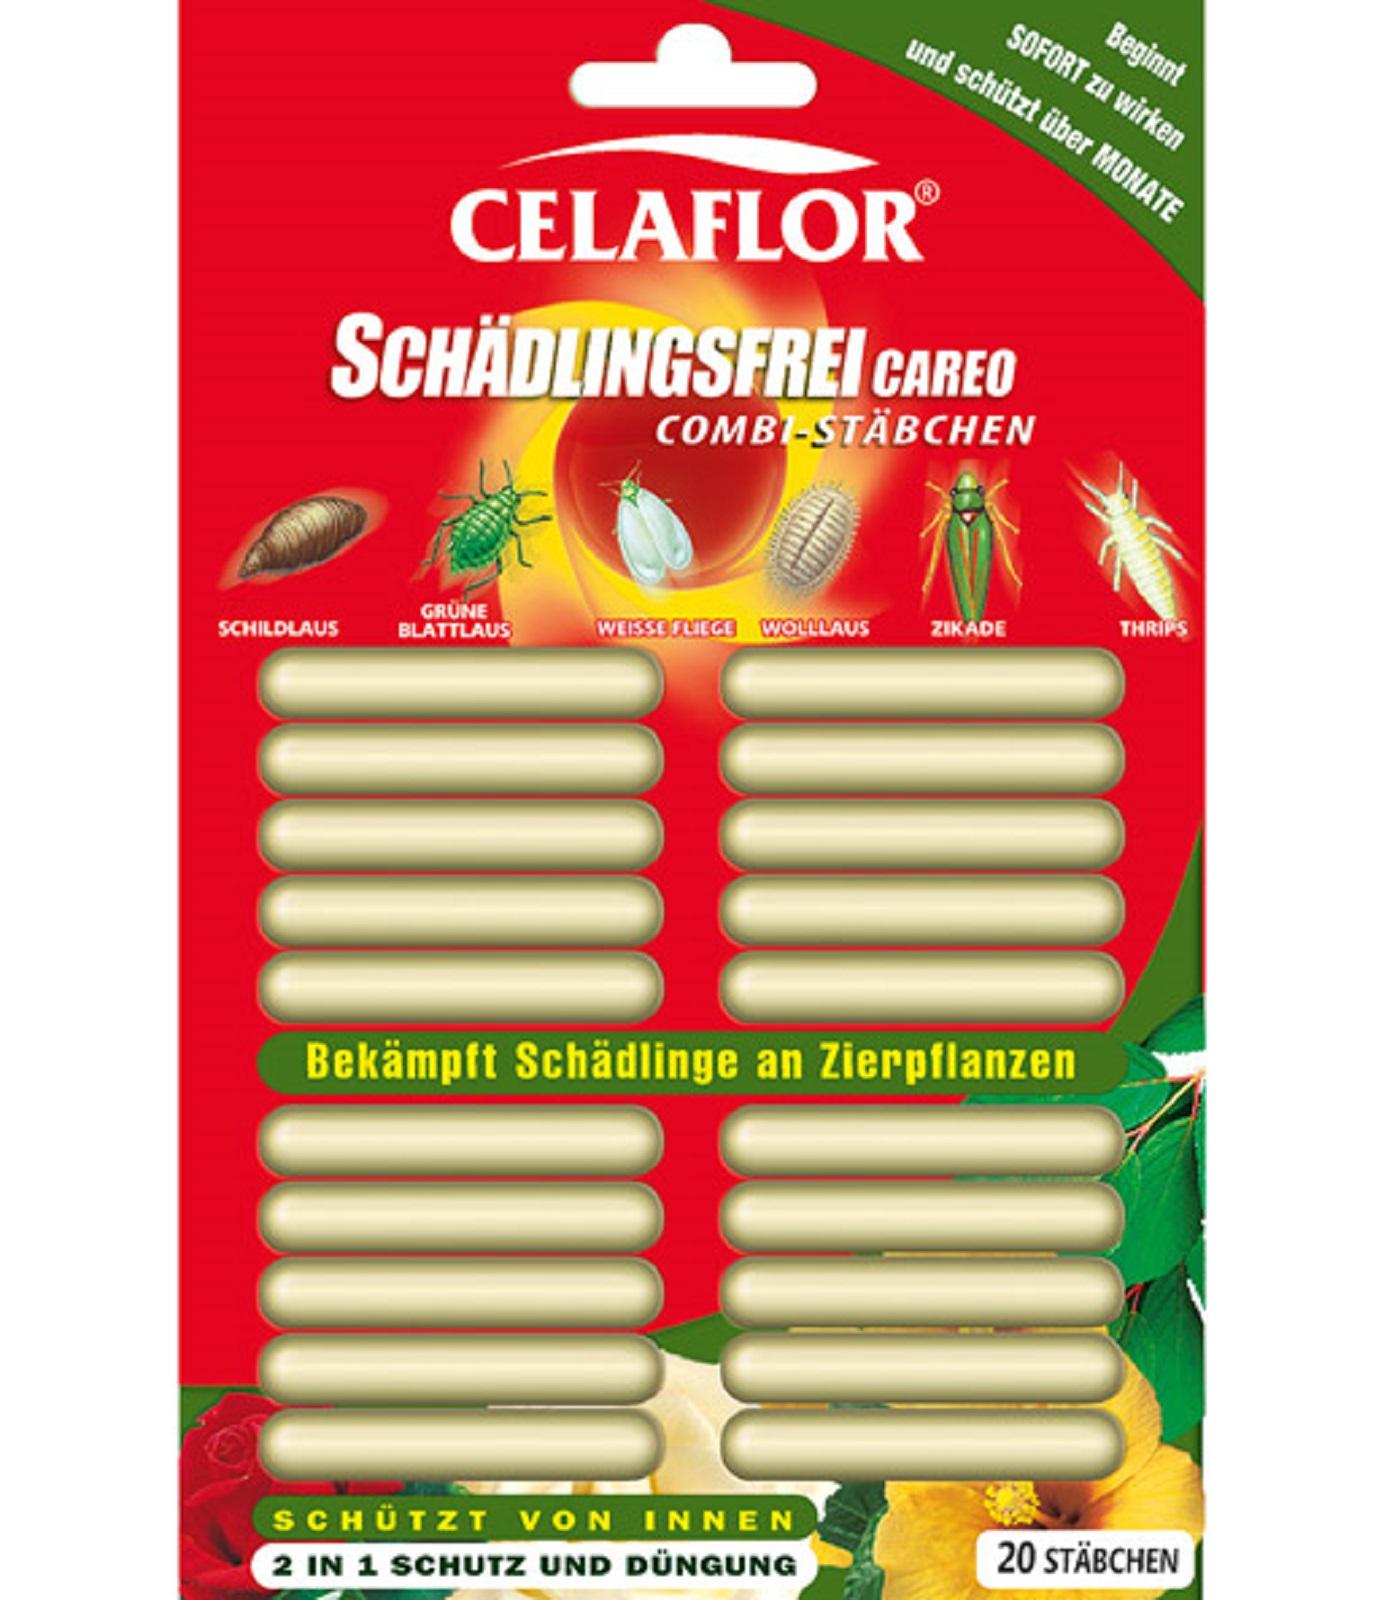 Celaflor Schädlingsfrei CAREO Combi Stäbchen 20 Stück